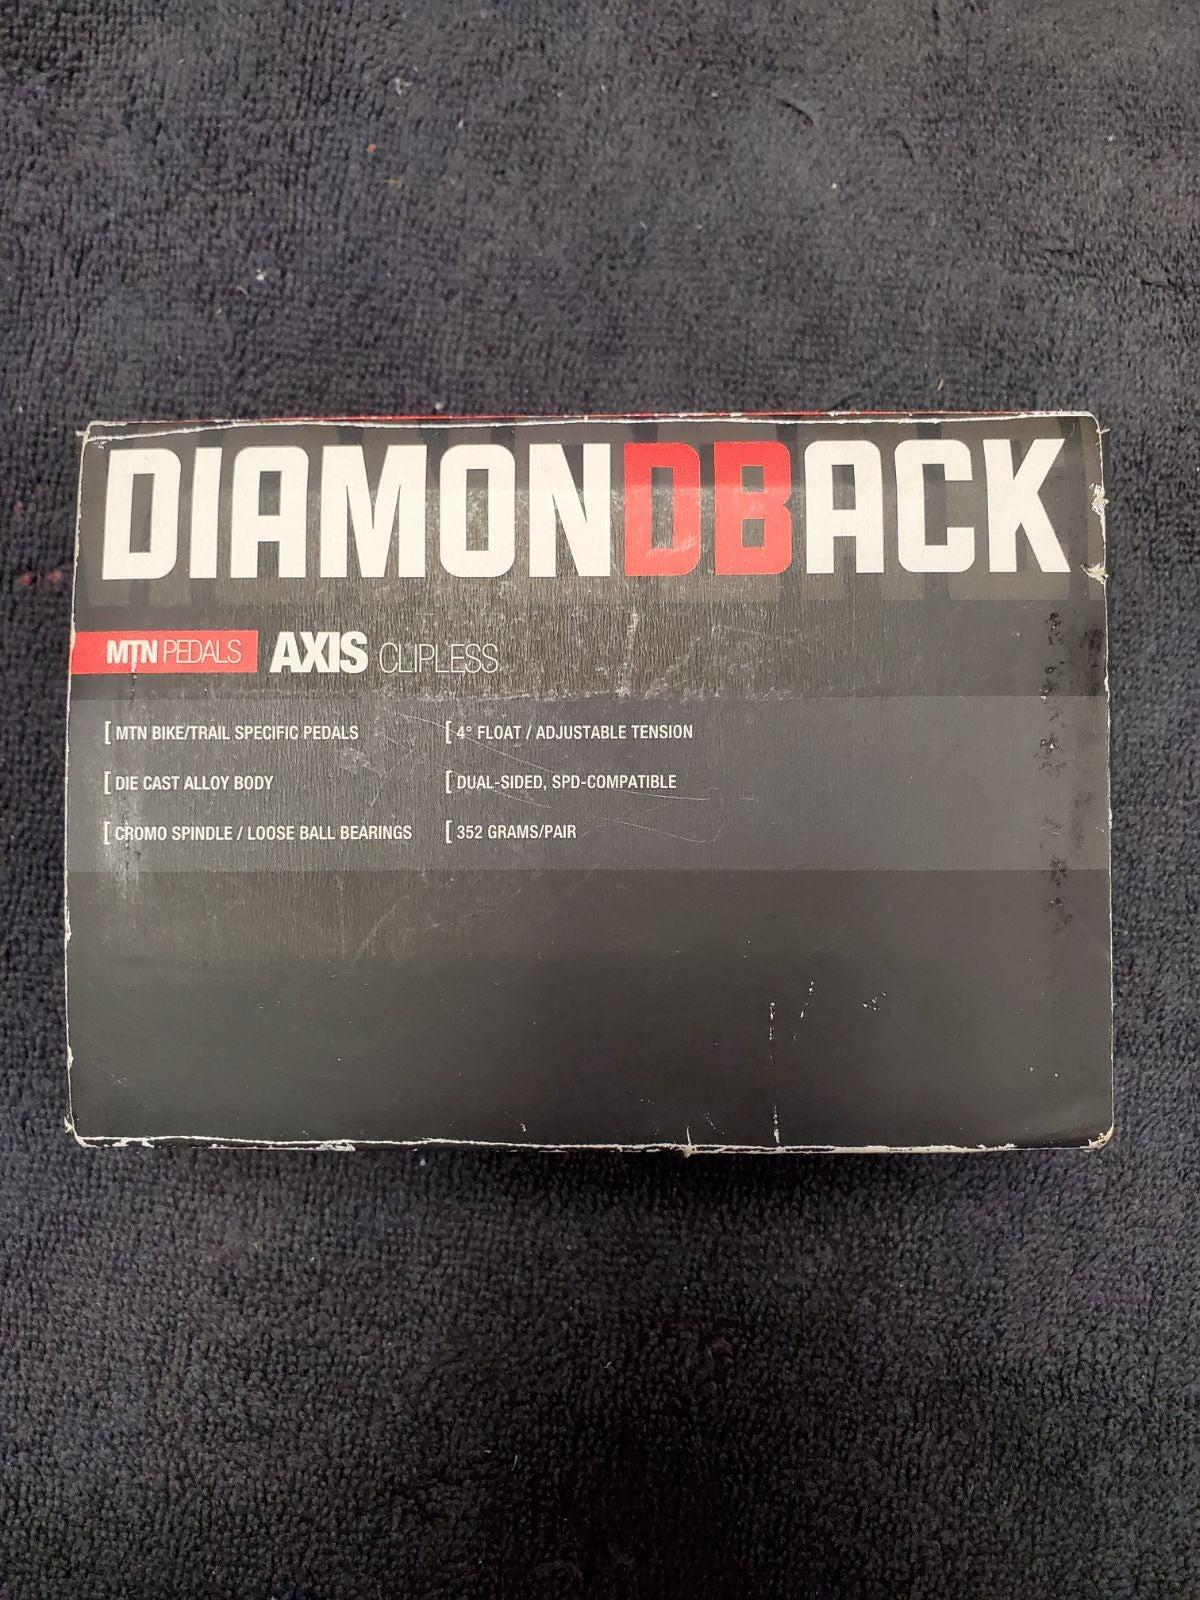 Diamondback MTN pedals axis clipless